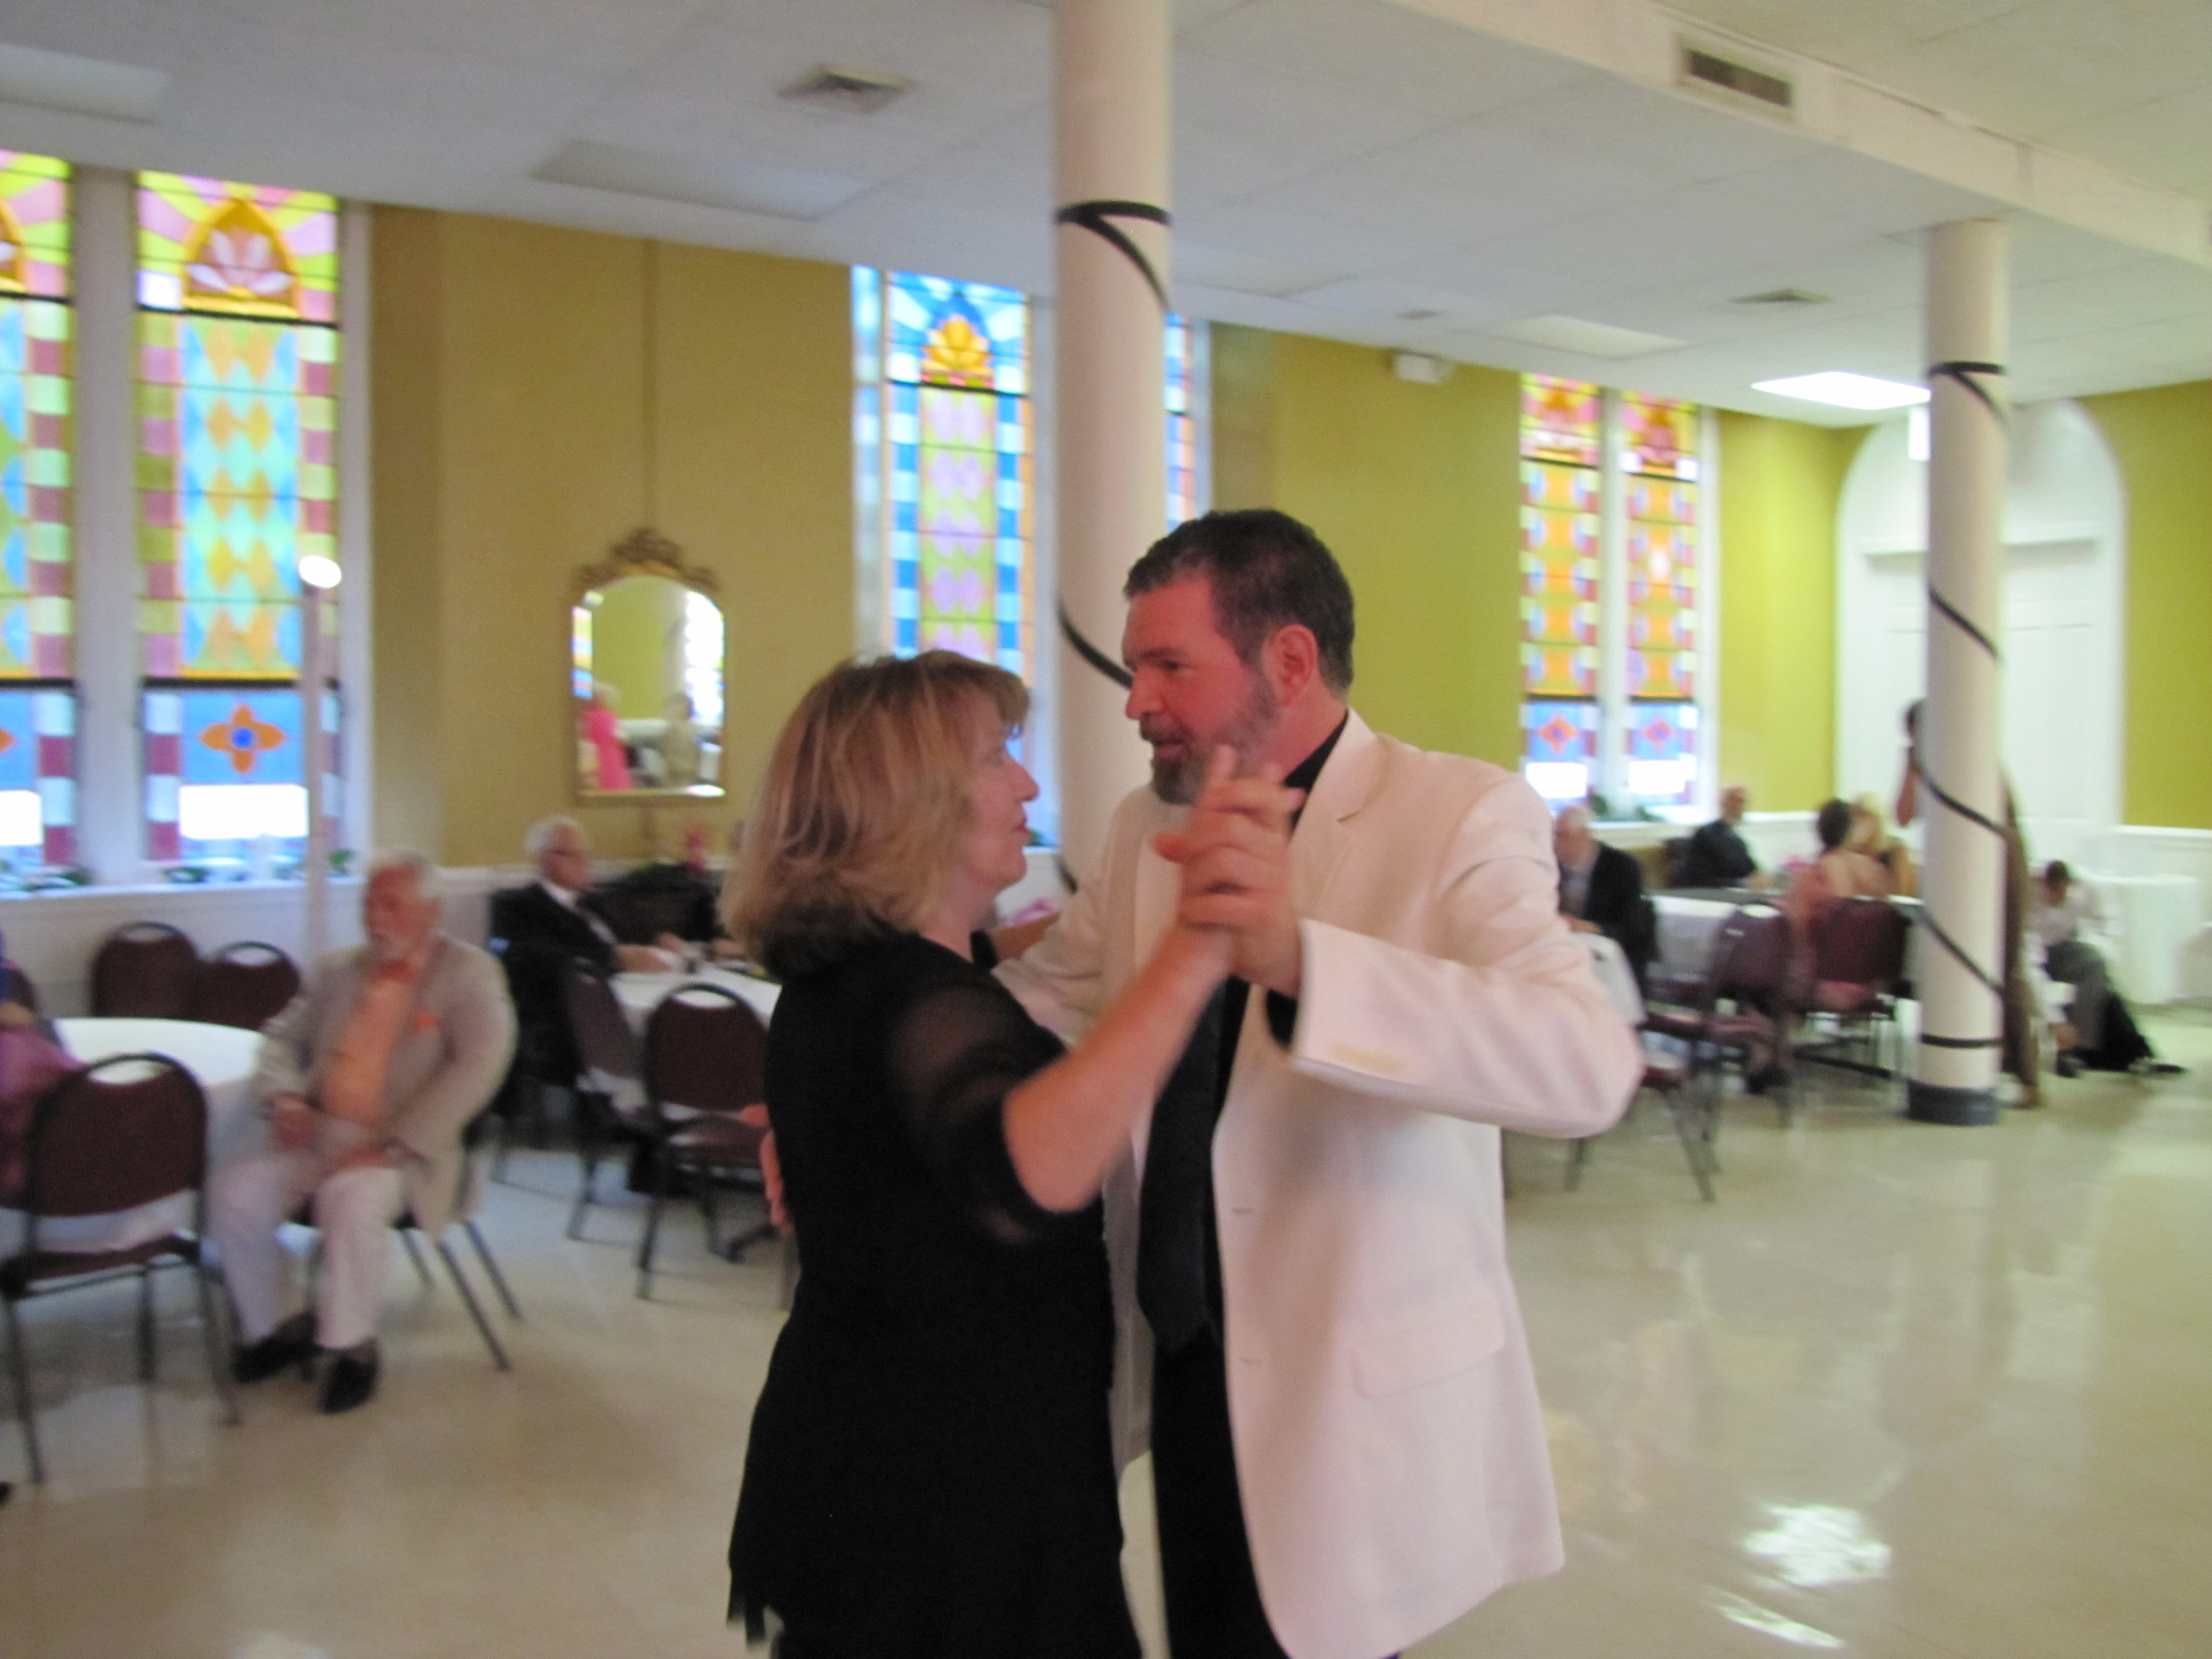 Dances For Fun